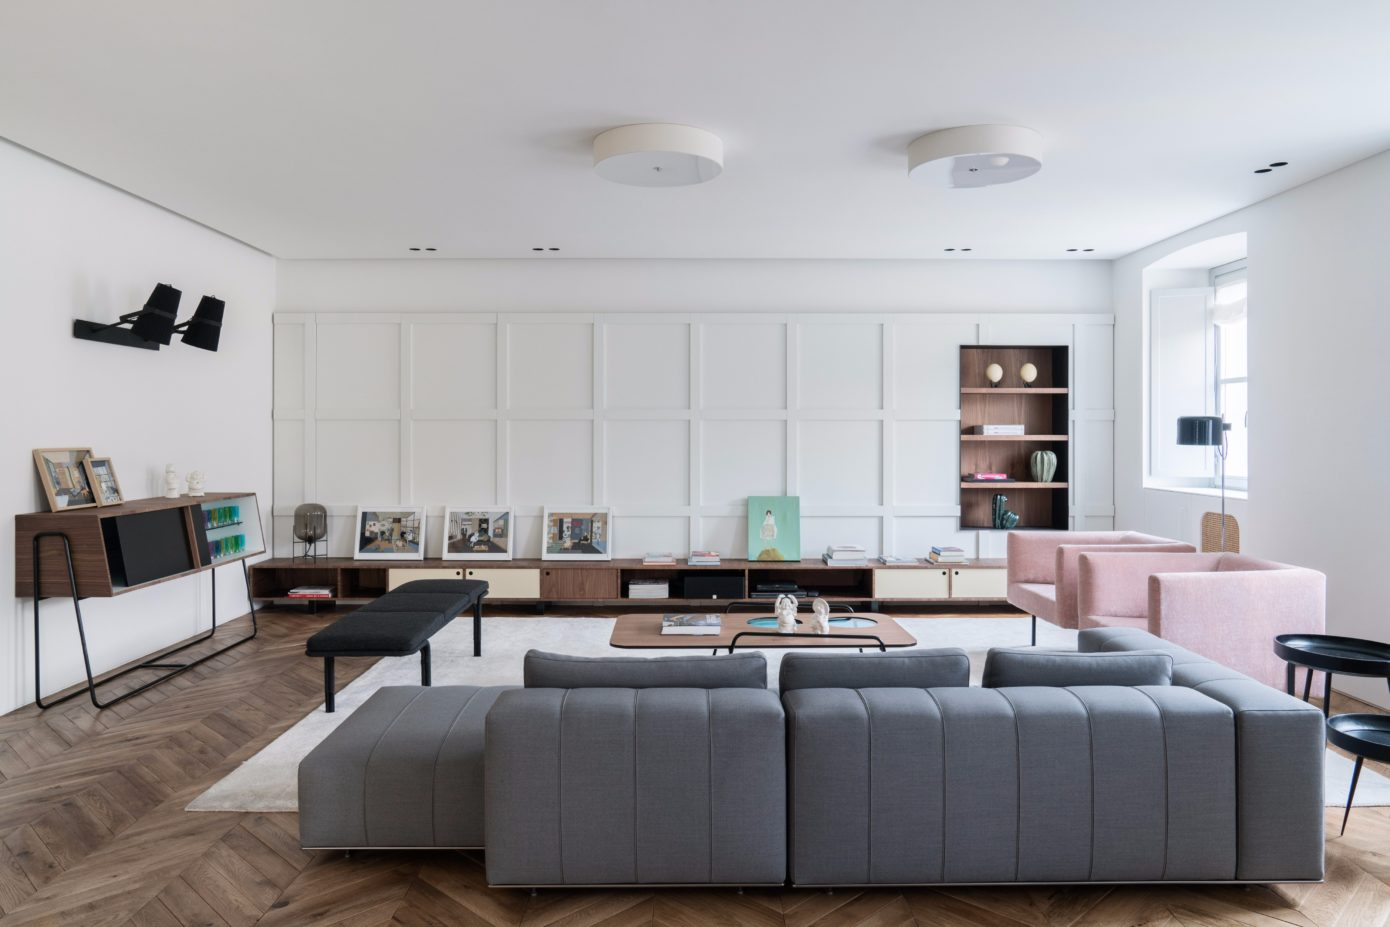 Lagrange House by Fabio Fantolino